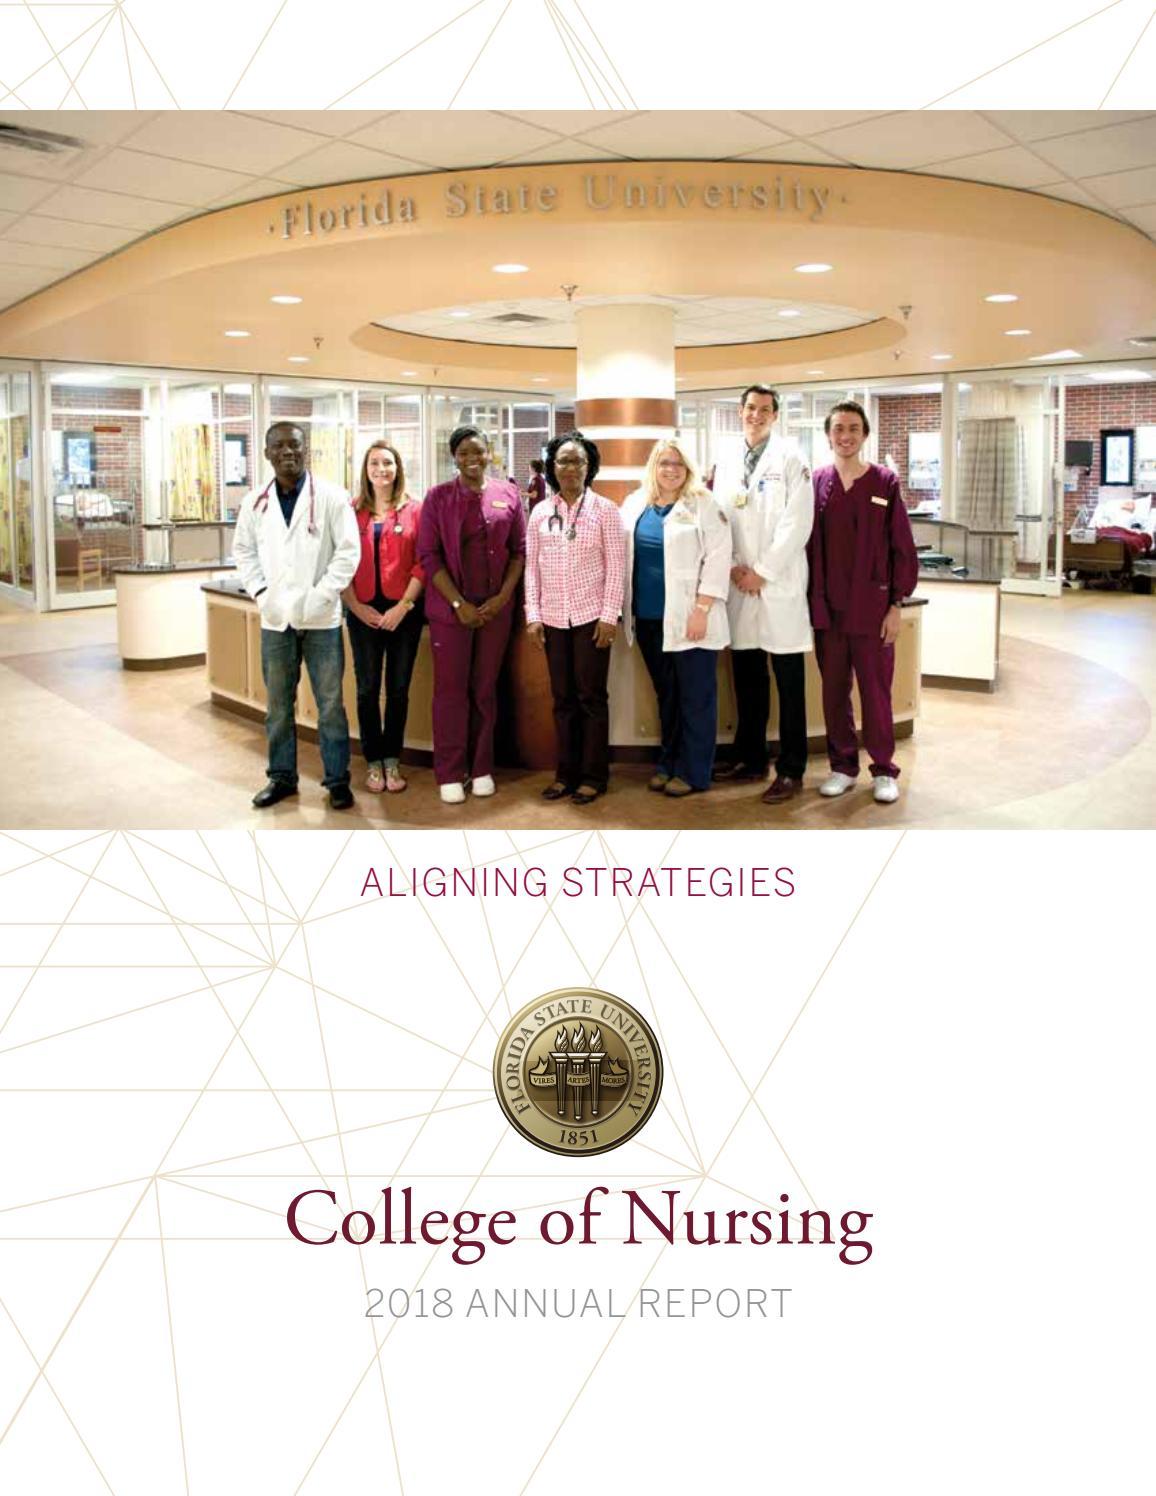 Florida State University College of Nursing 2018 Annual